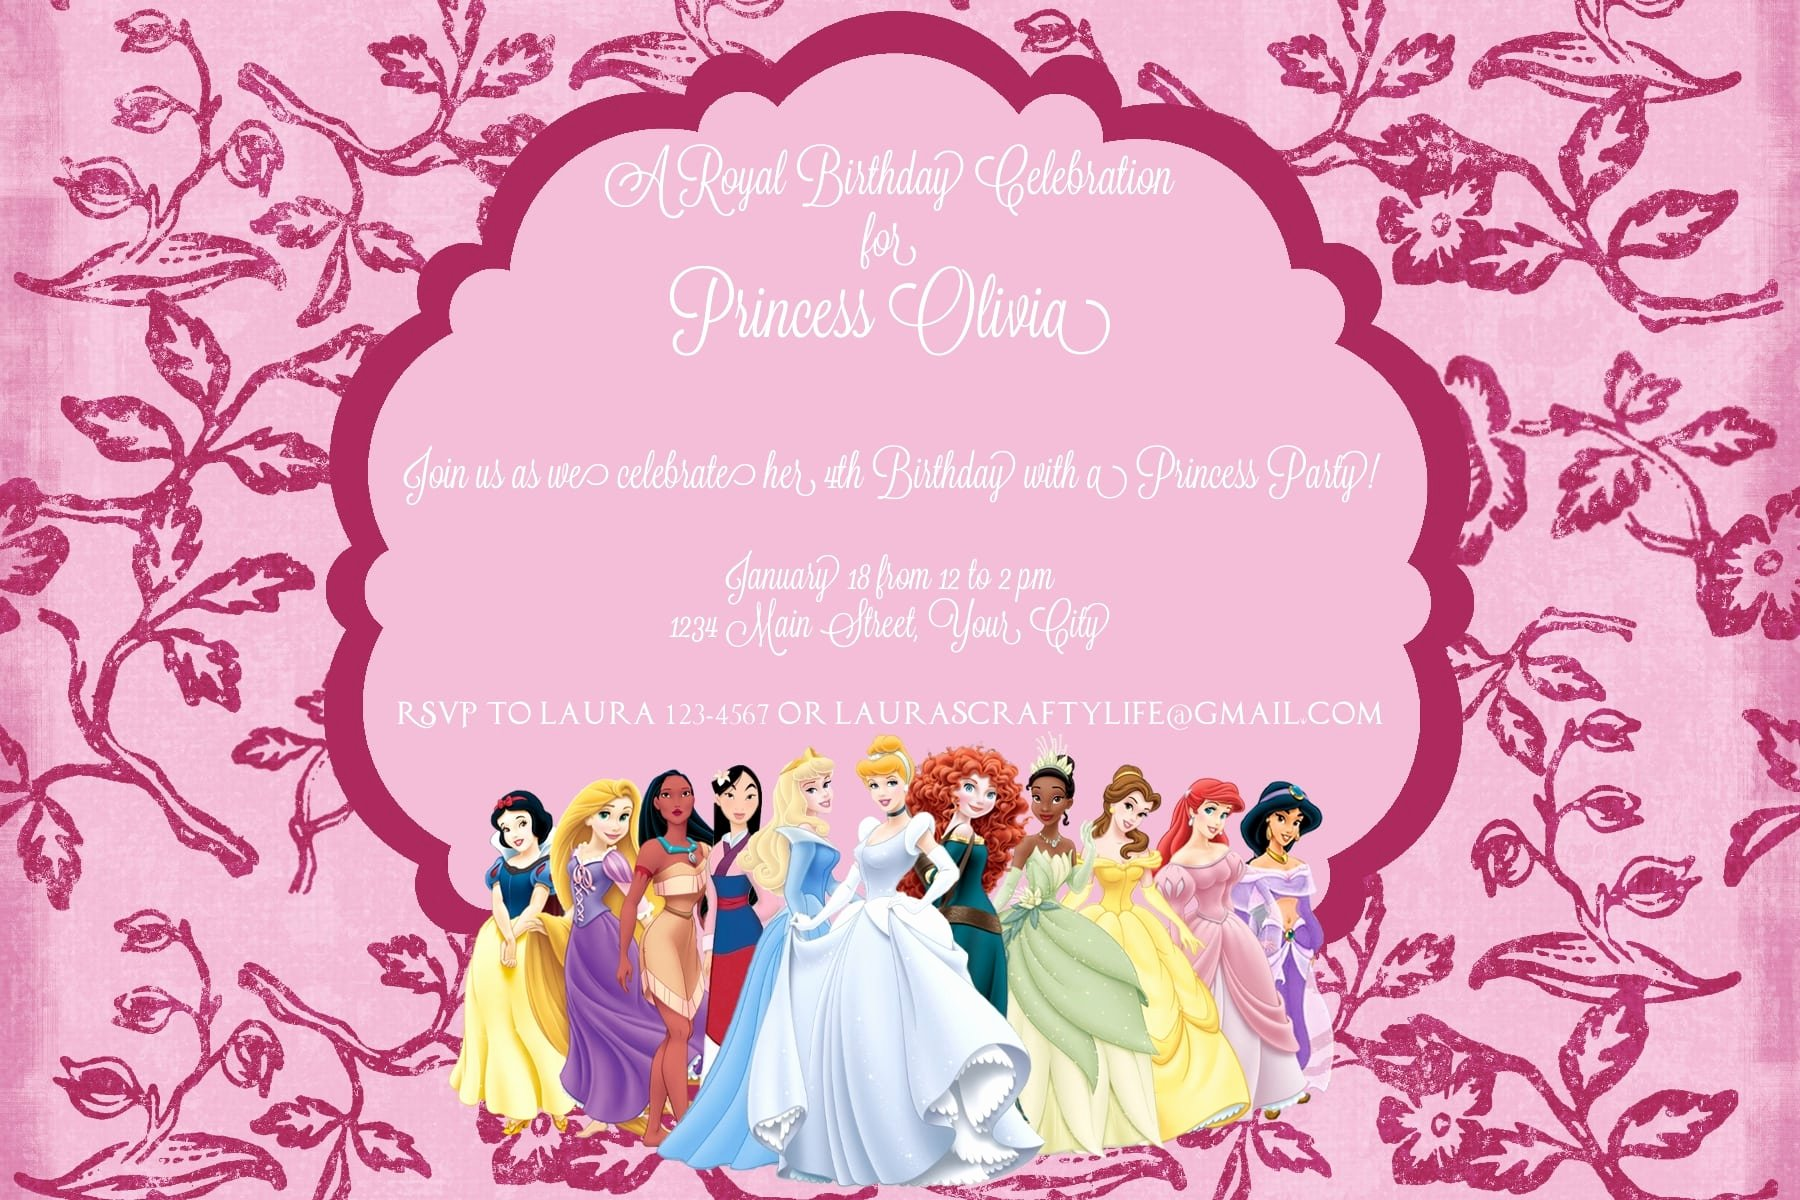 Princess Party Invitation Template Inspirational Tea Party Princess Invitation